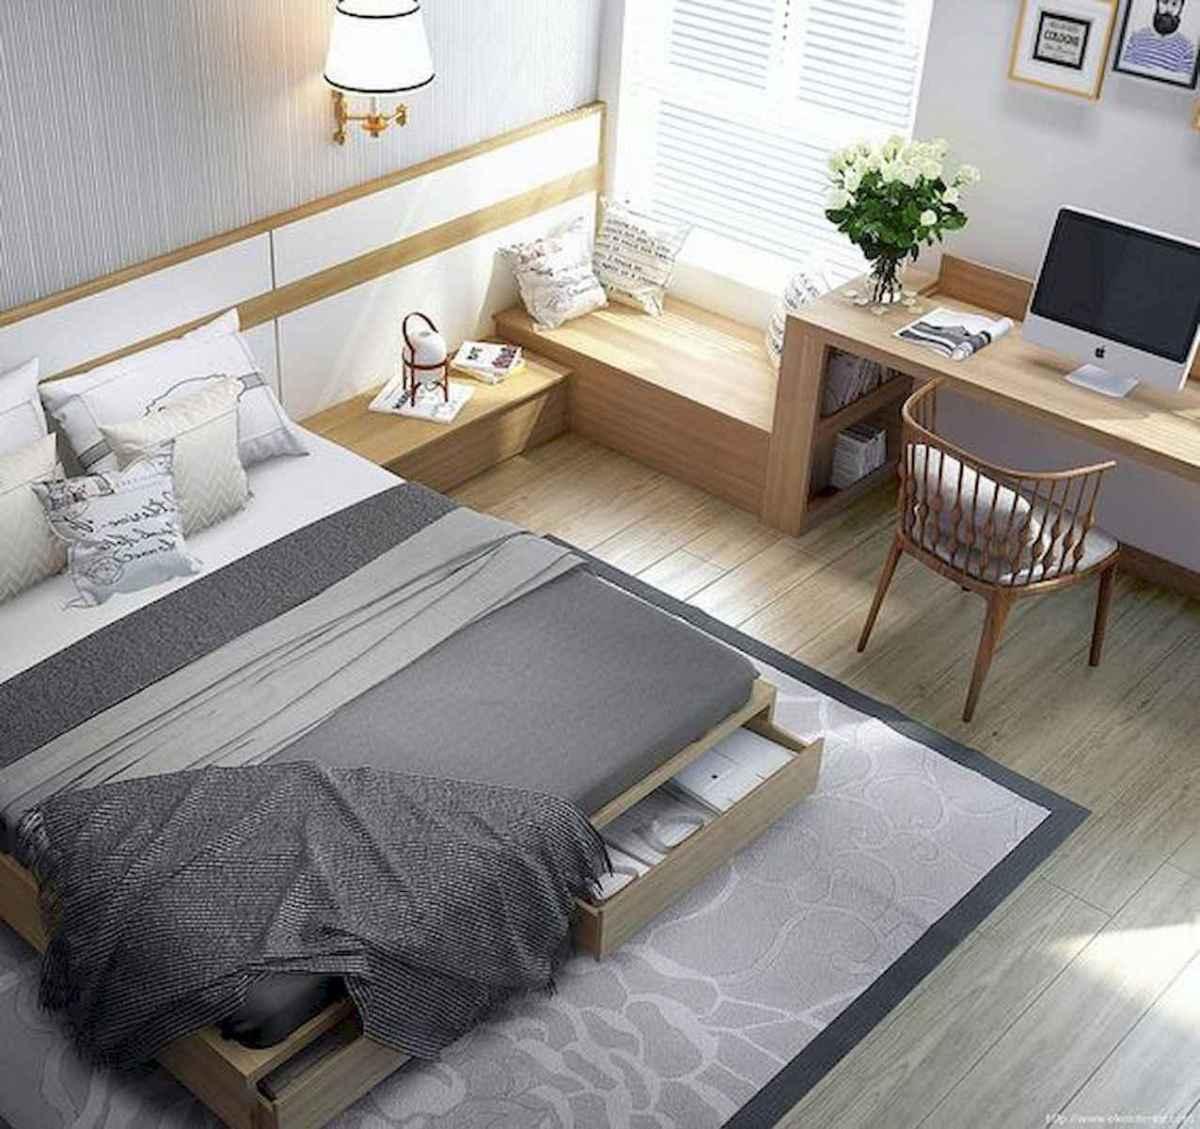 80 Fantastic Small Apartment Bedroom College Design Ideas and Decor (62)